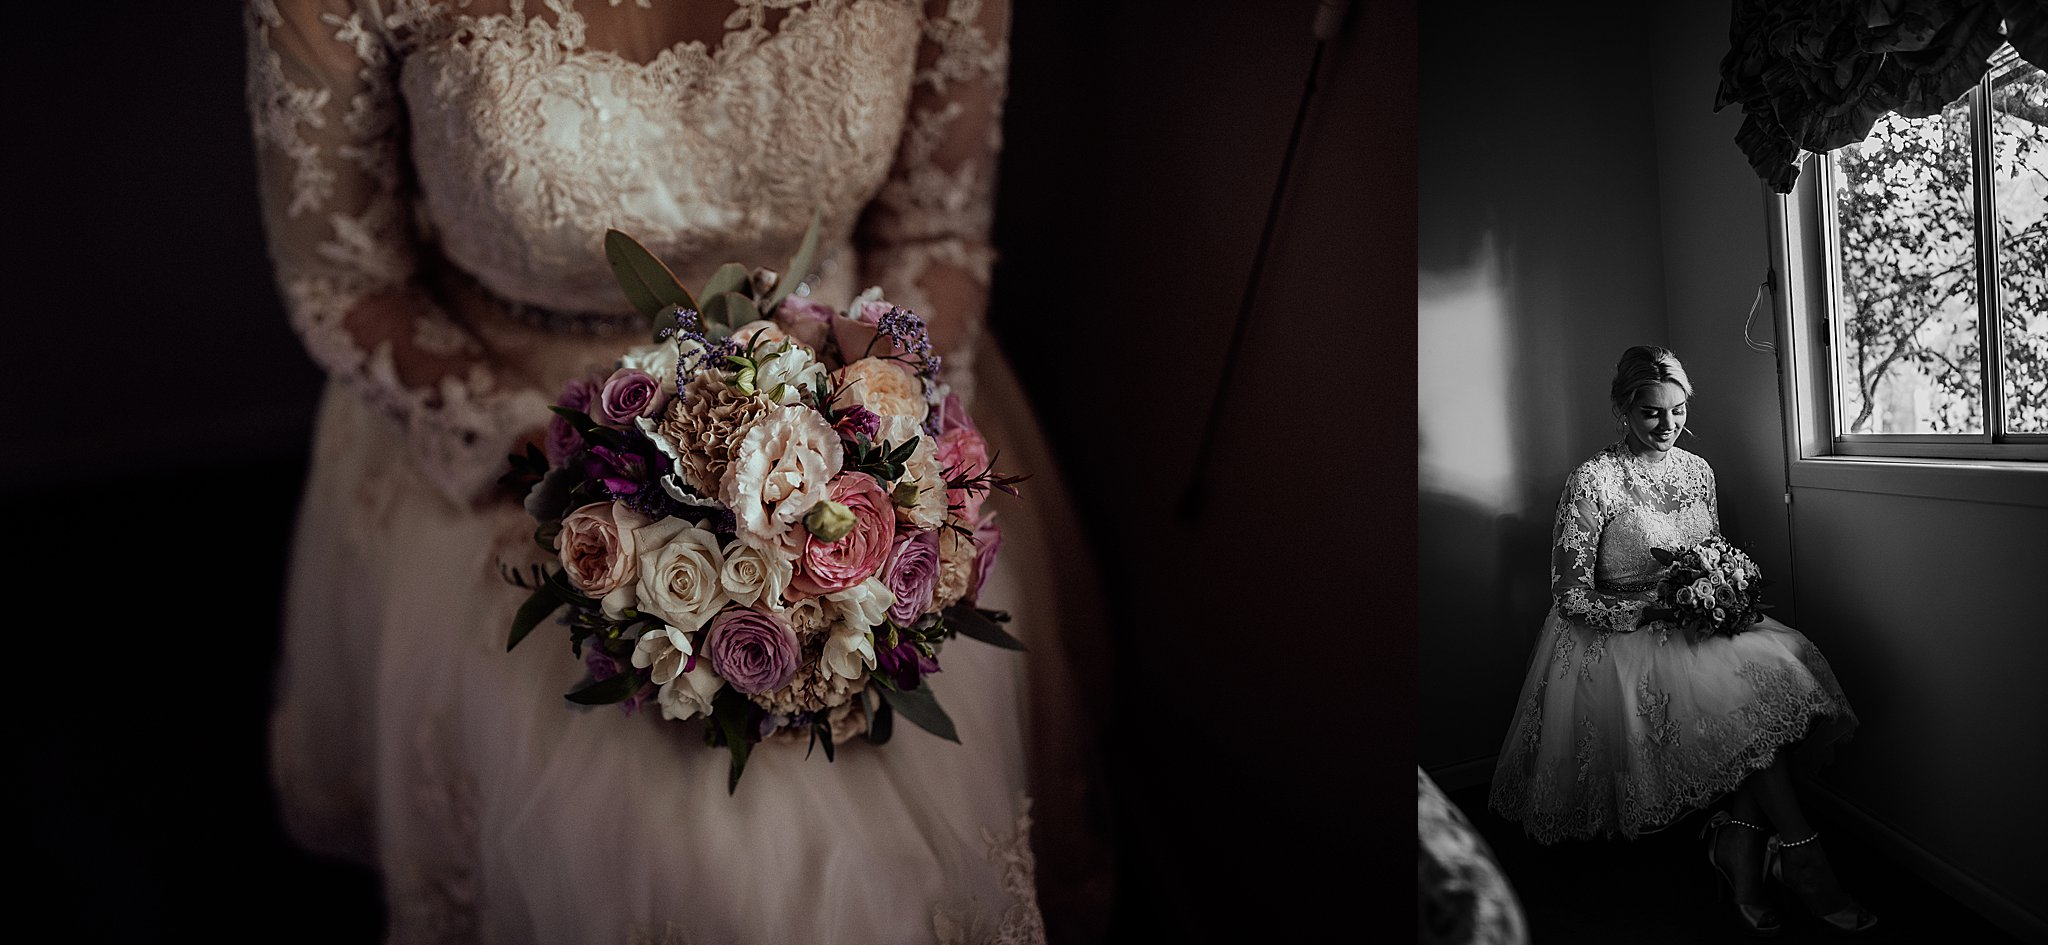 mickalathomas_puremacphotography_weddingphotographer_couplephotographer_Sheppartonphotographer_3385.jpg